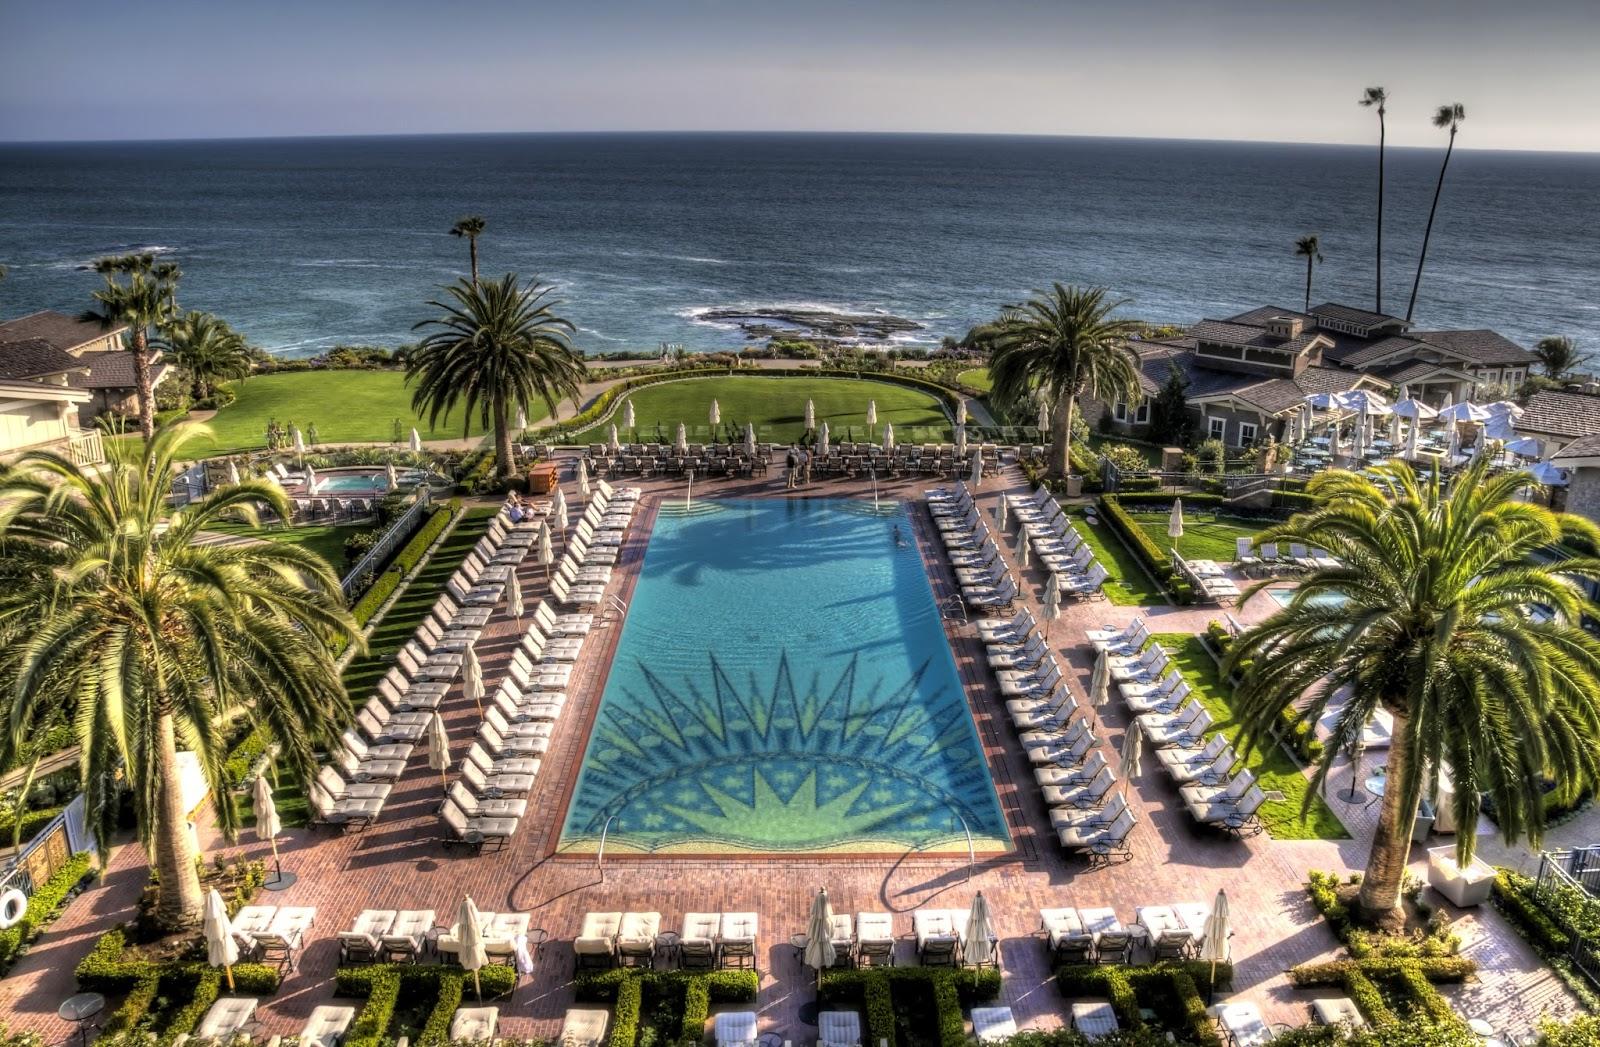 luxury hotels montage laguna beach offers. Black Bedroom Furniture Sets. Home Design Ideas